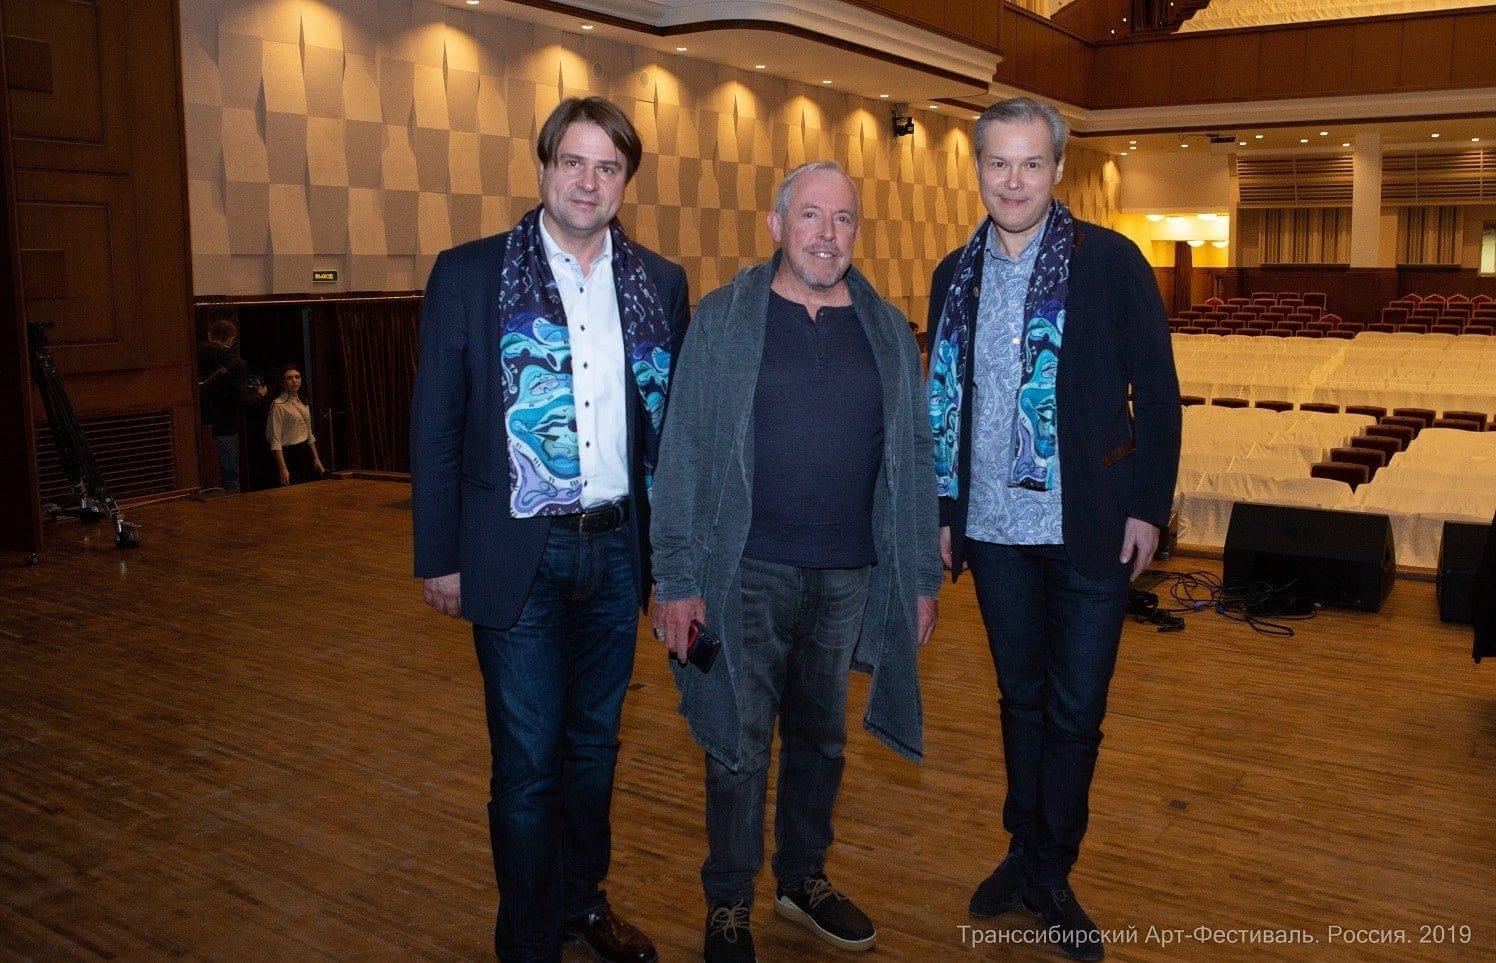 Олег Белый, Андрей Макаревич, Вадим Репин. Фото - Александр Иванов